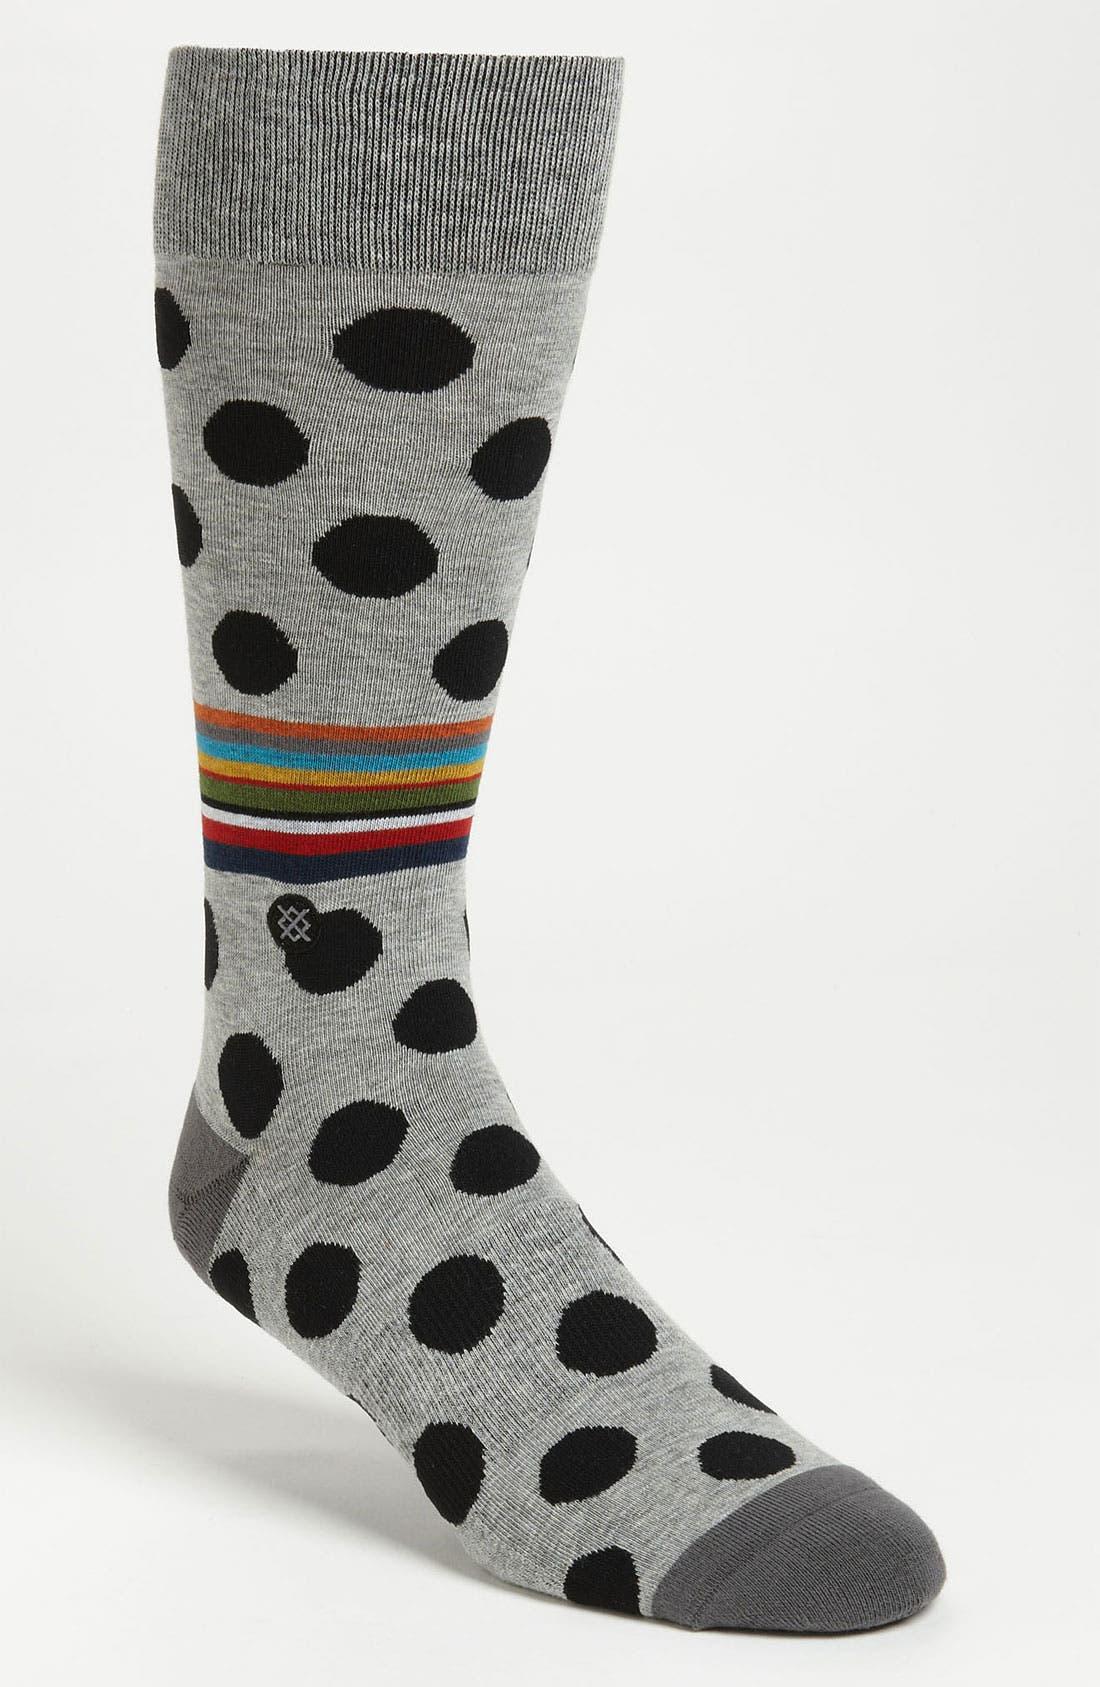 Alternate Image 1 Selected - Stance 'Cranston' Socks